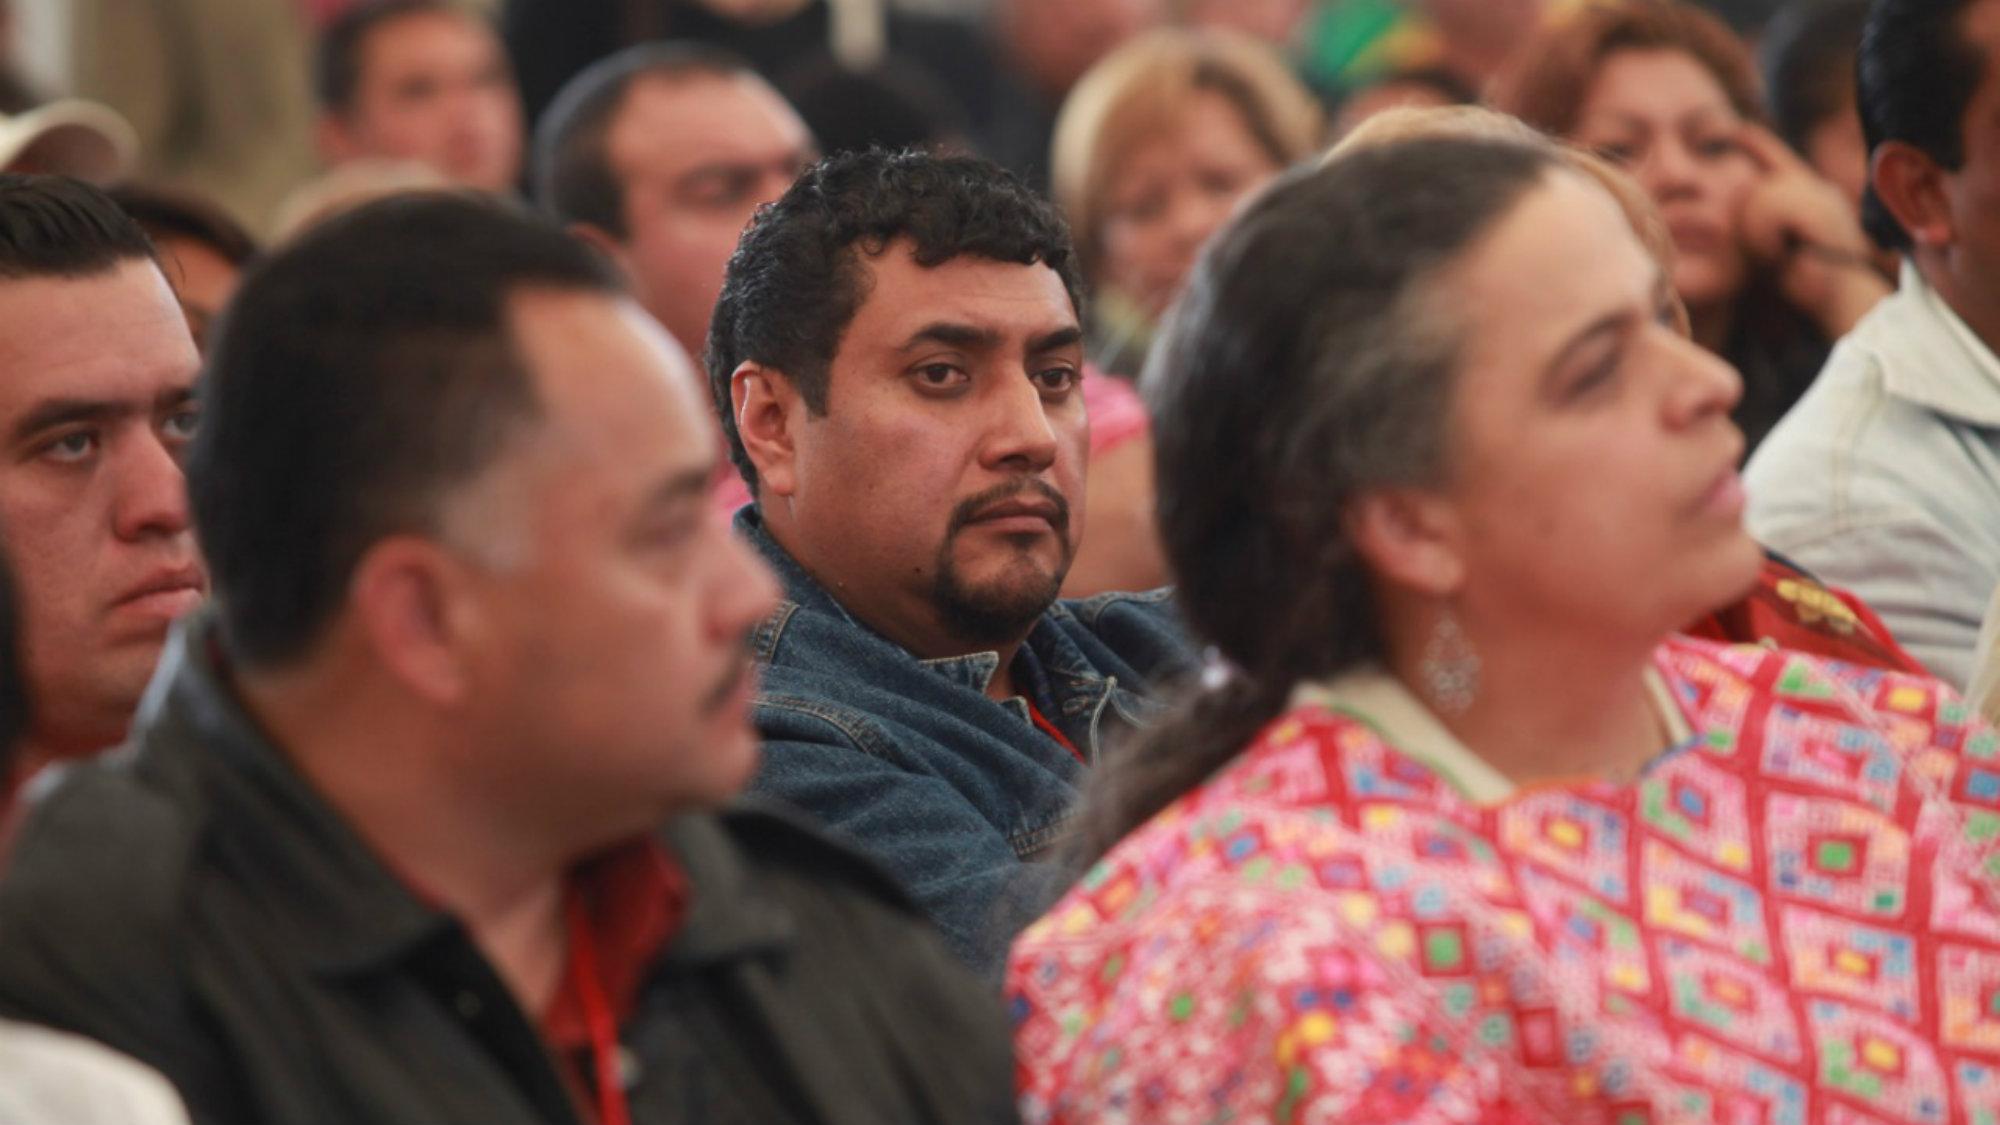 Eddy Ortiz Exdiputado PRD Asesinato Tiro a la cabeza Tláhuac CDMX